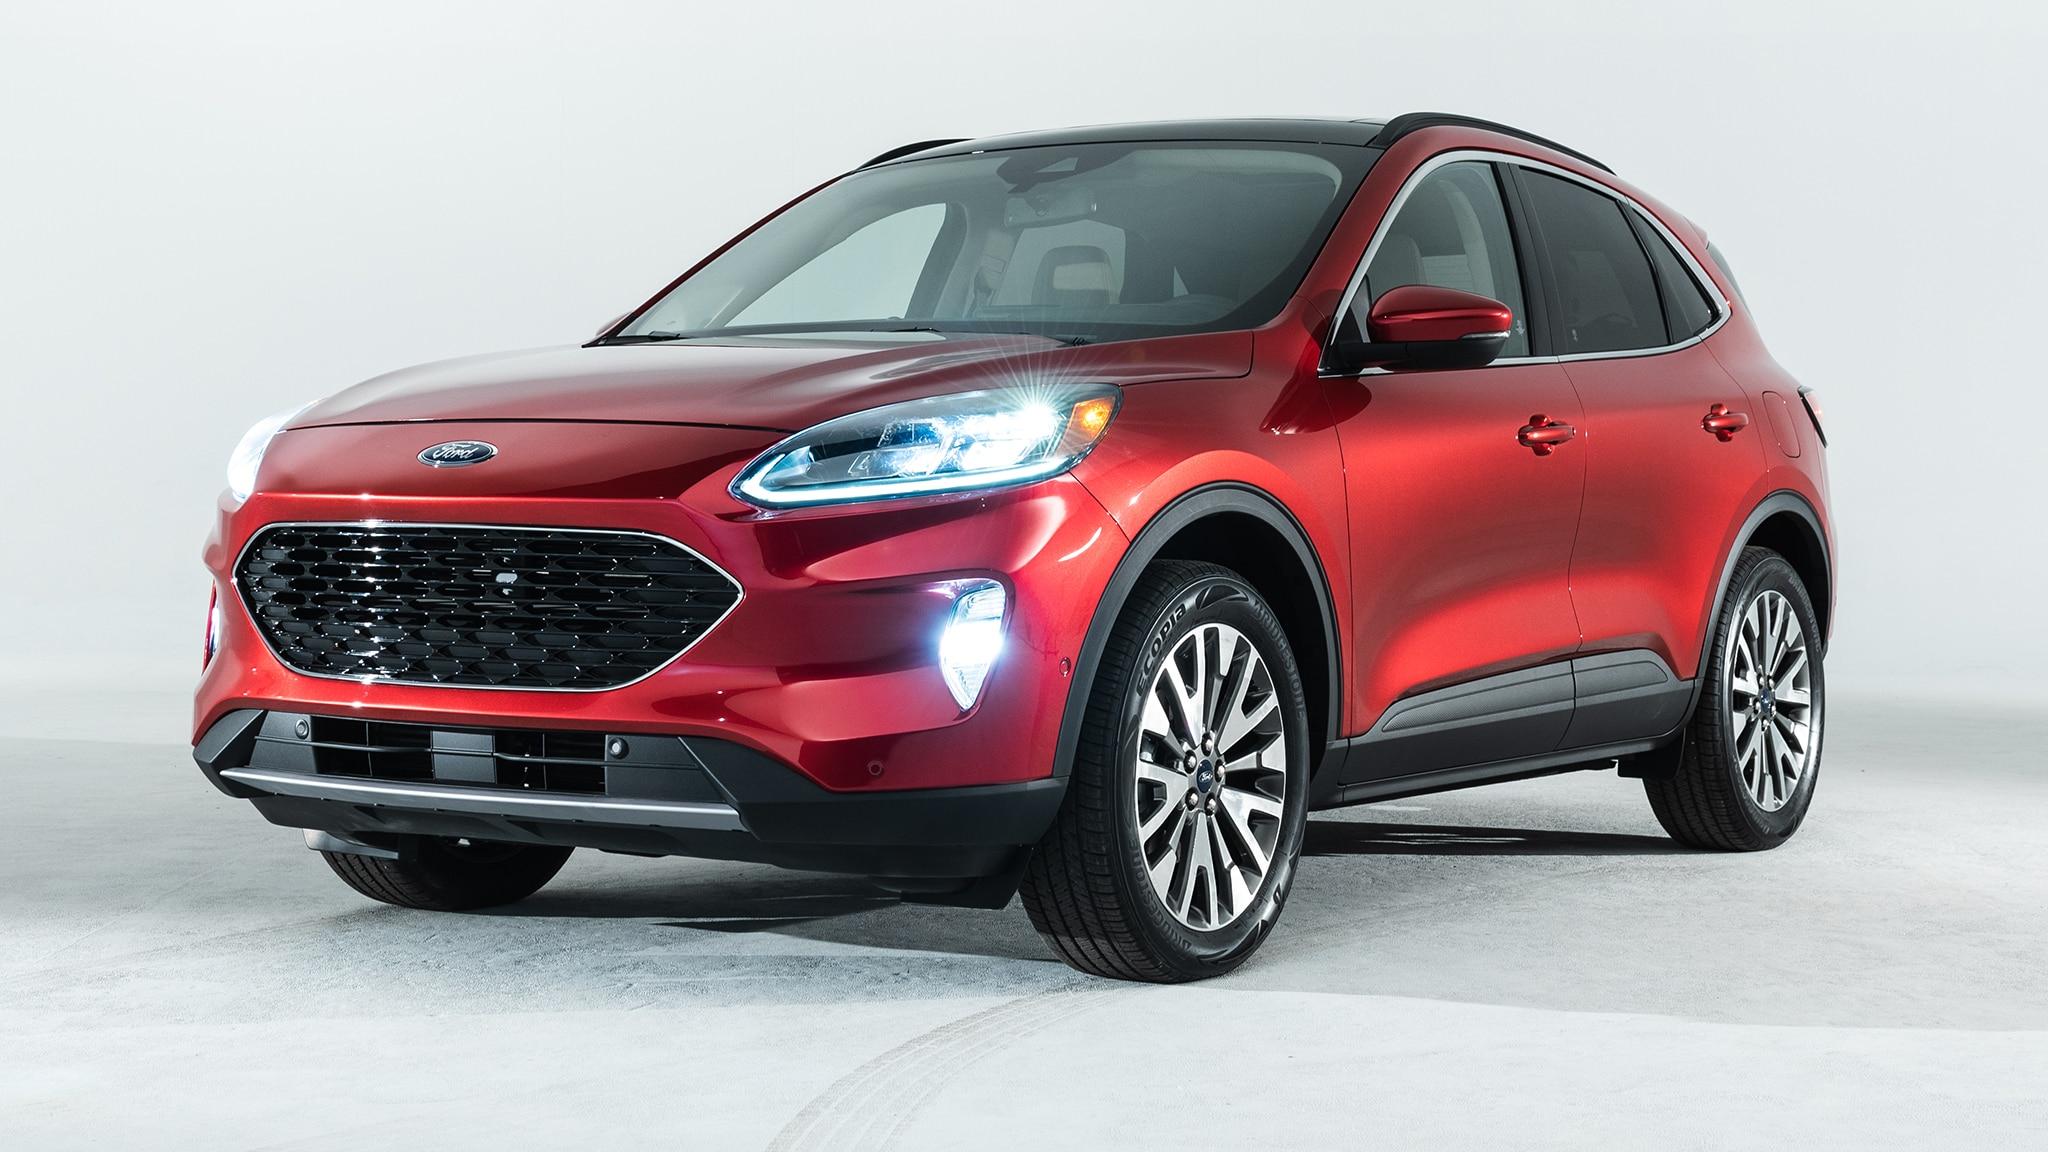 2020 Ford Escape: What We Know   Automobile Magazine